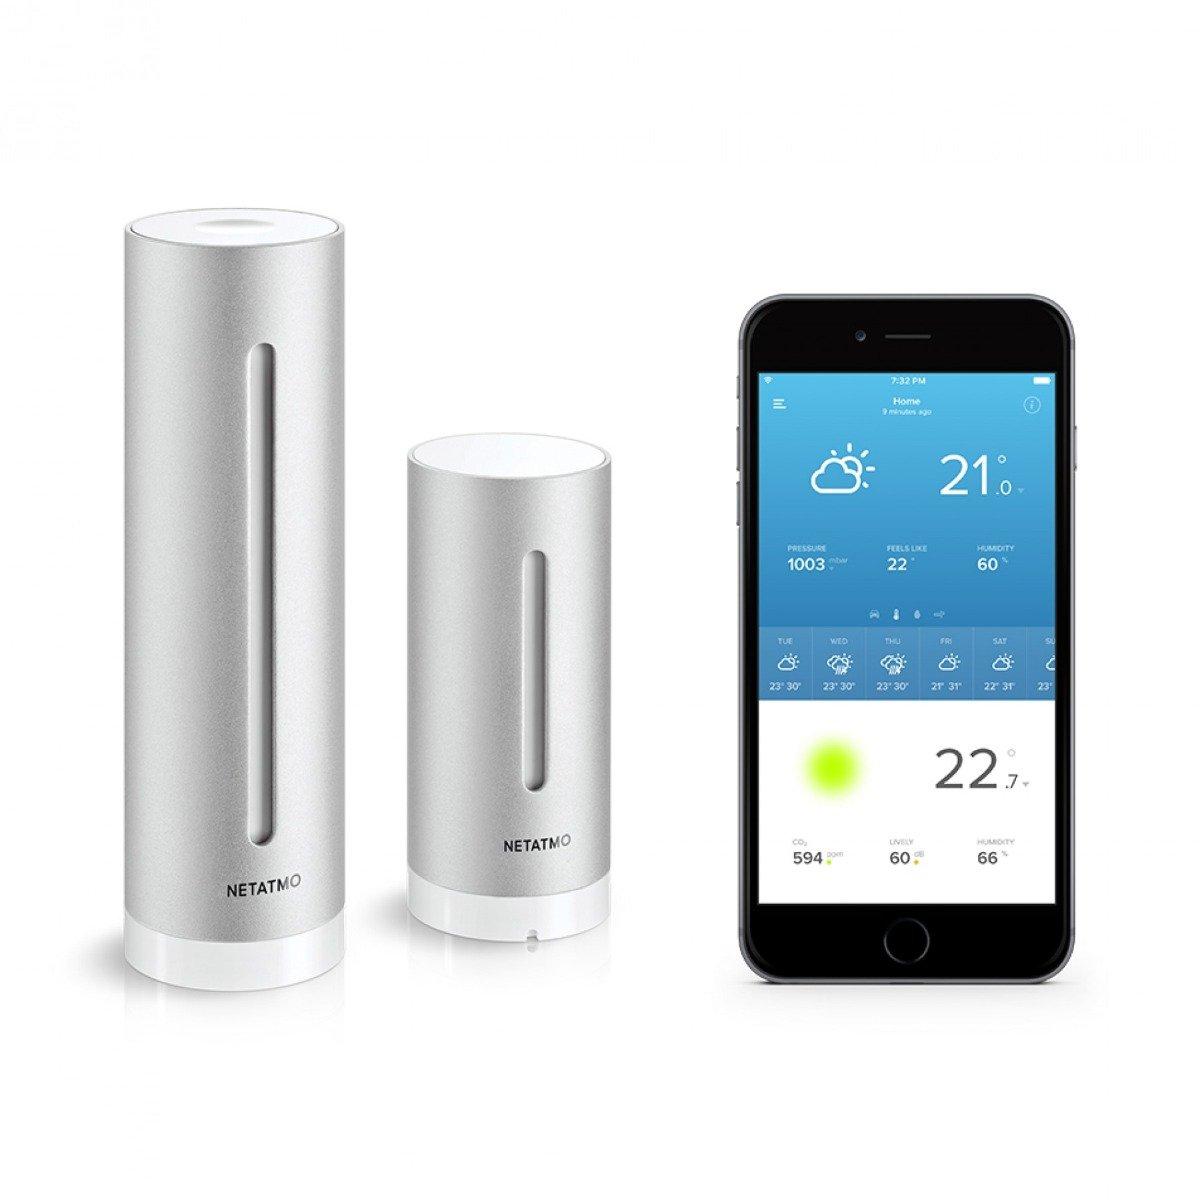 The Netatmo Smart Weather Station